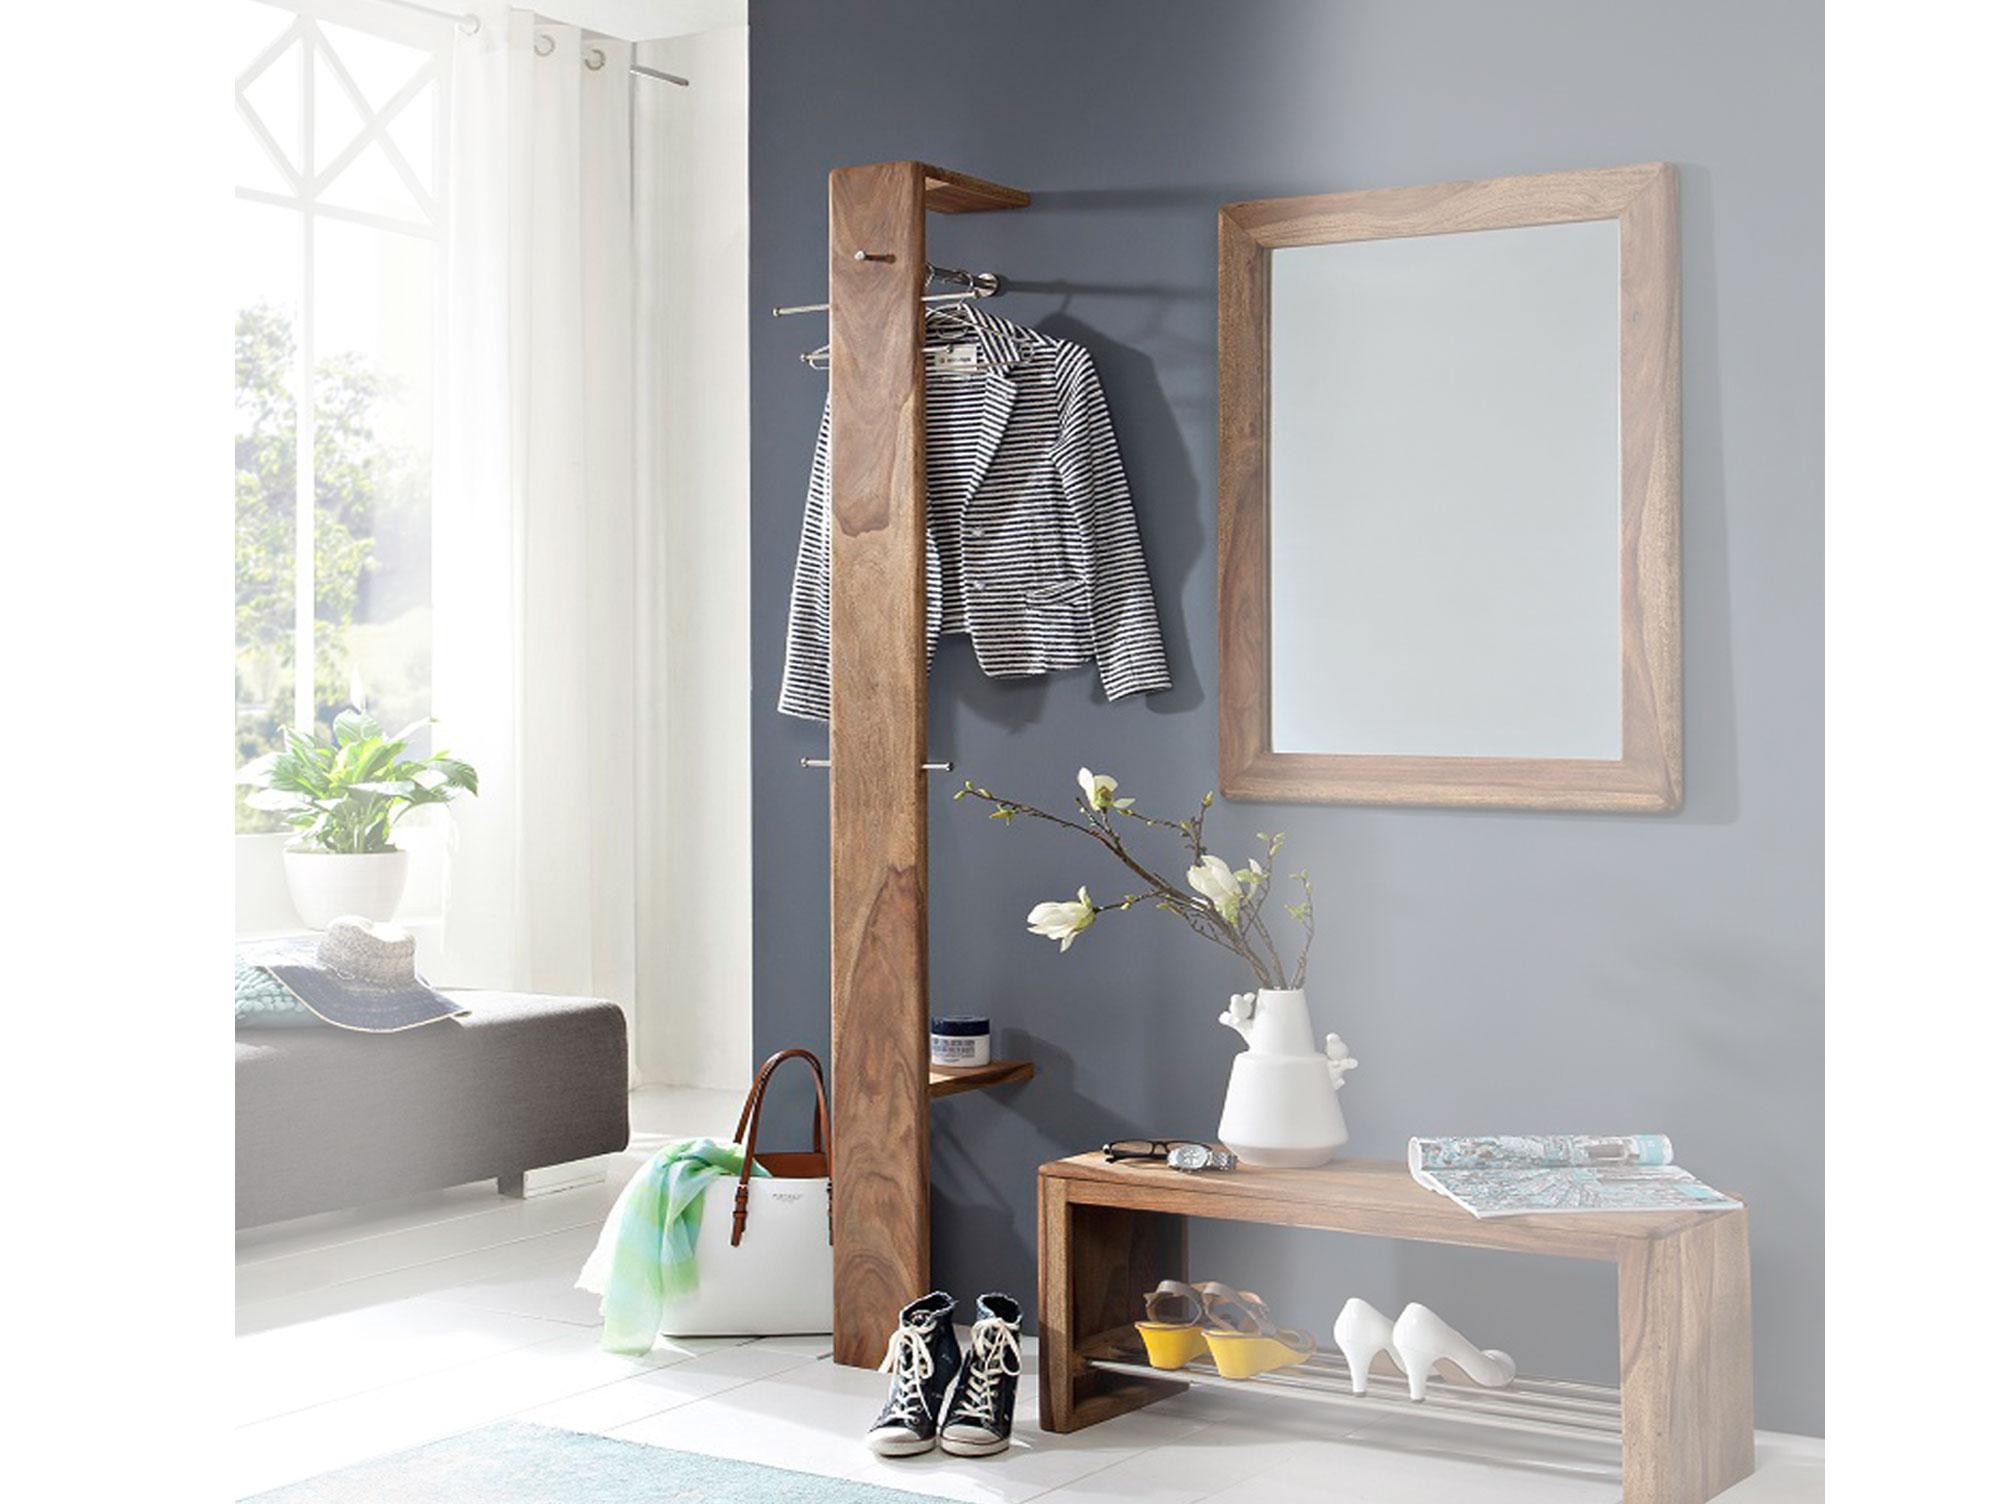 nils wandgarderobe sheesham gebeizt. Black Bedroom Furniture Sets. Home Design Ideas